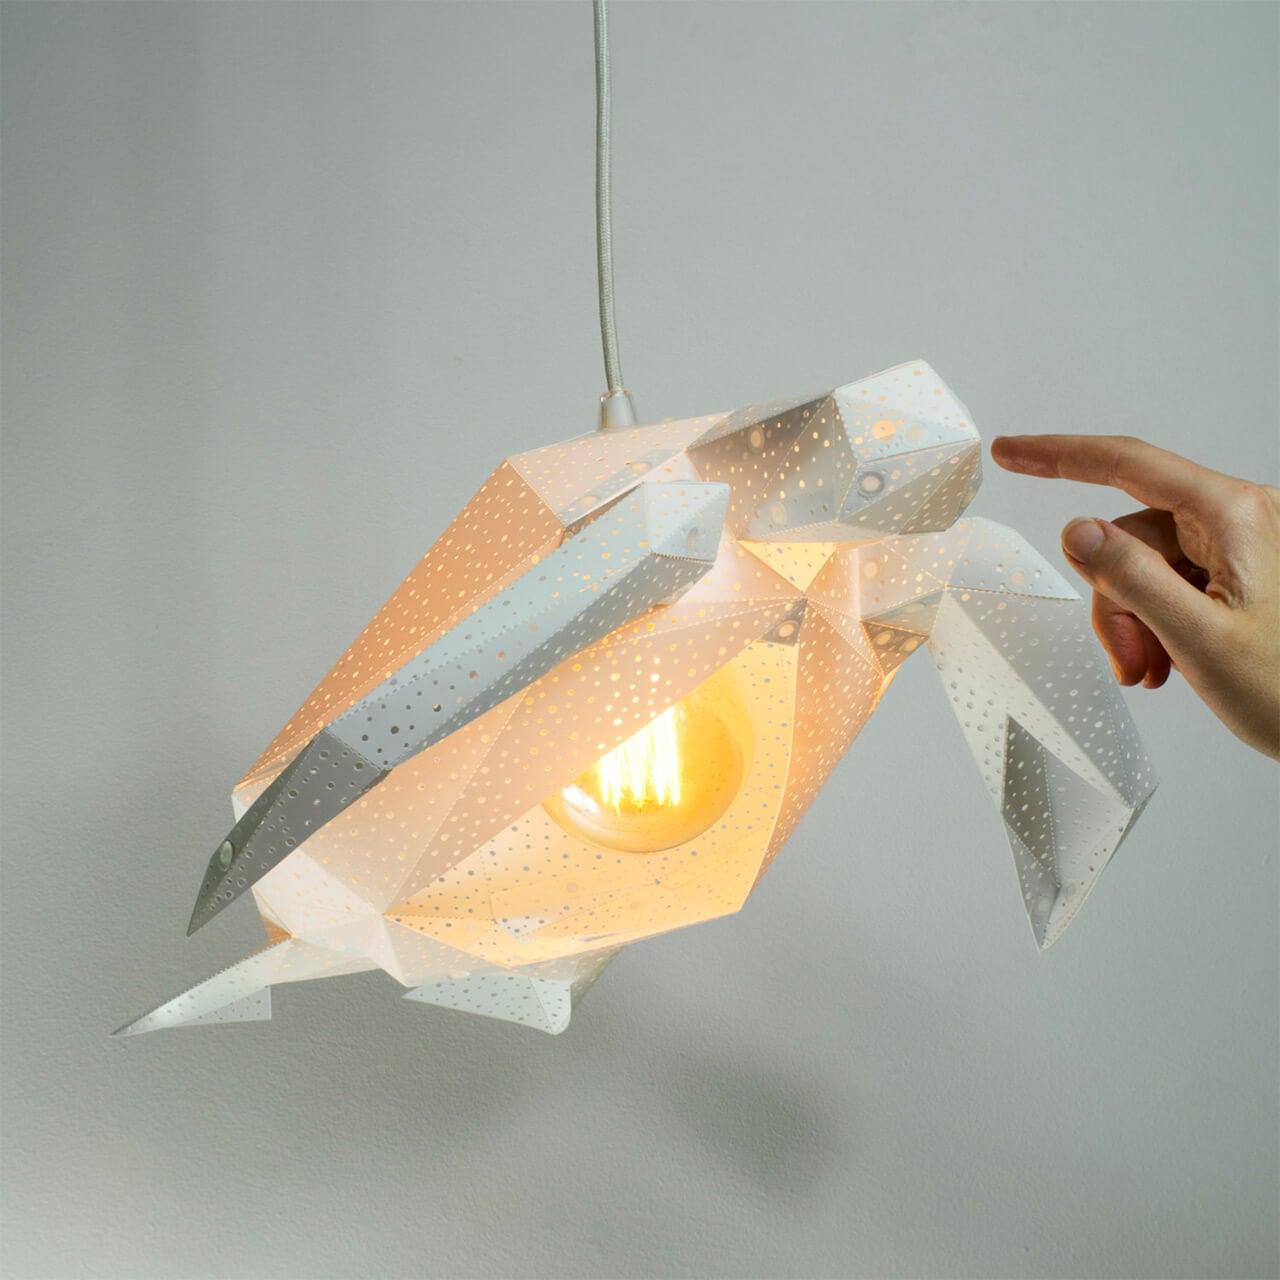 diy papercraft light shades vasili 7